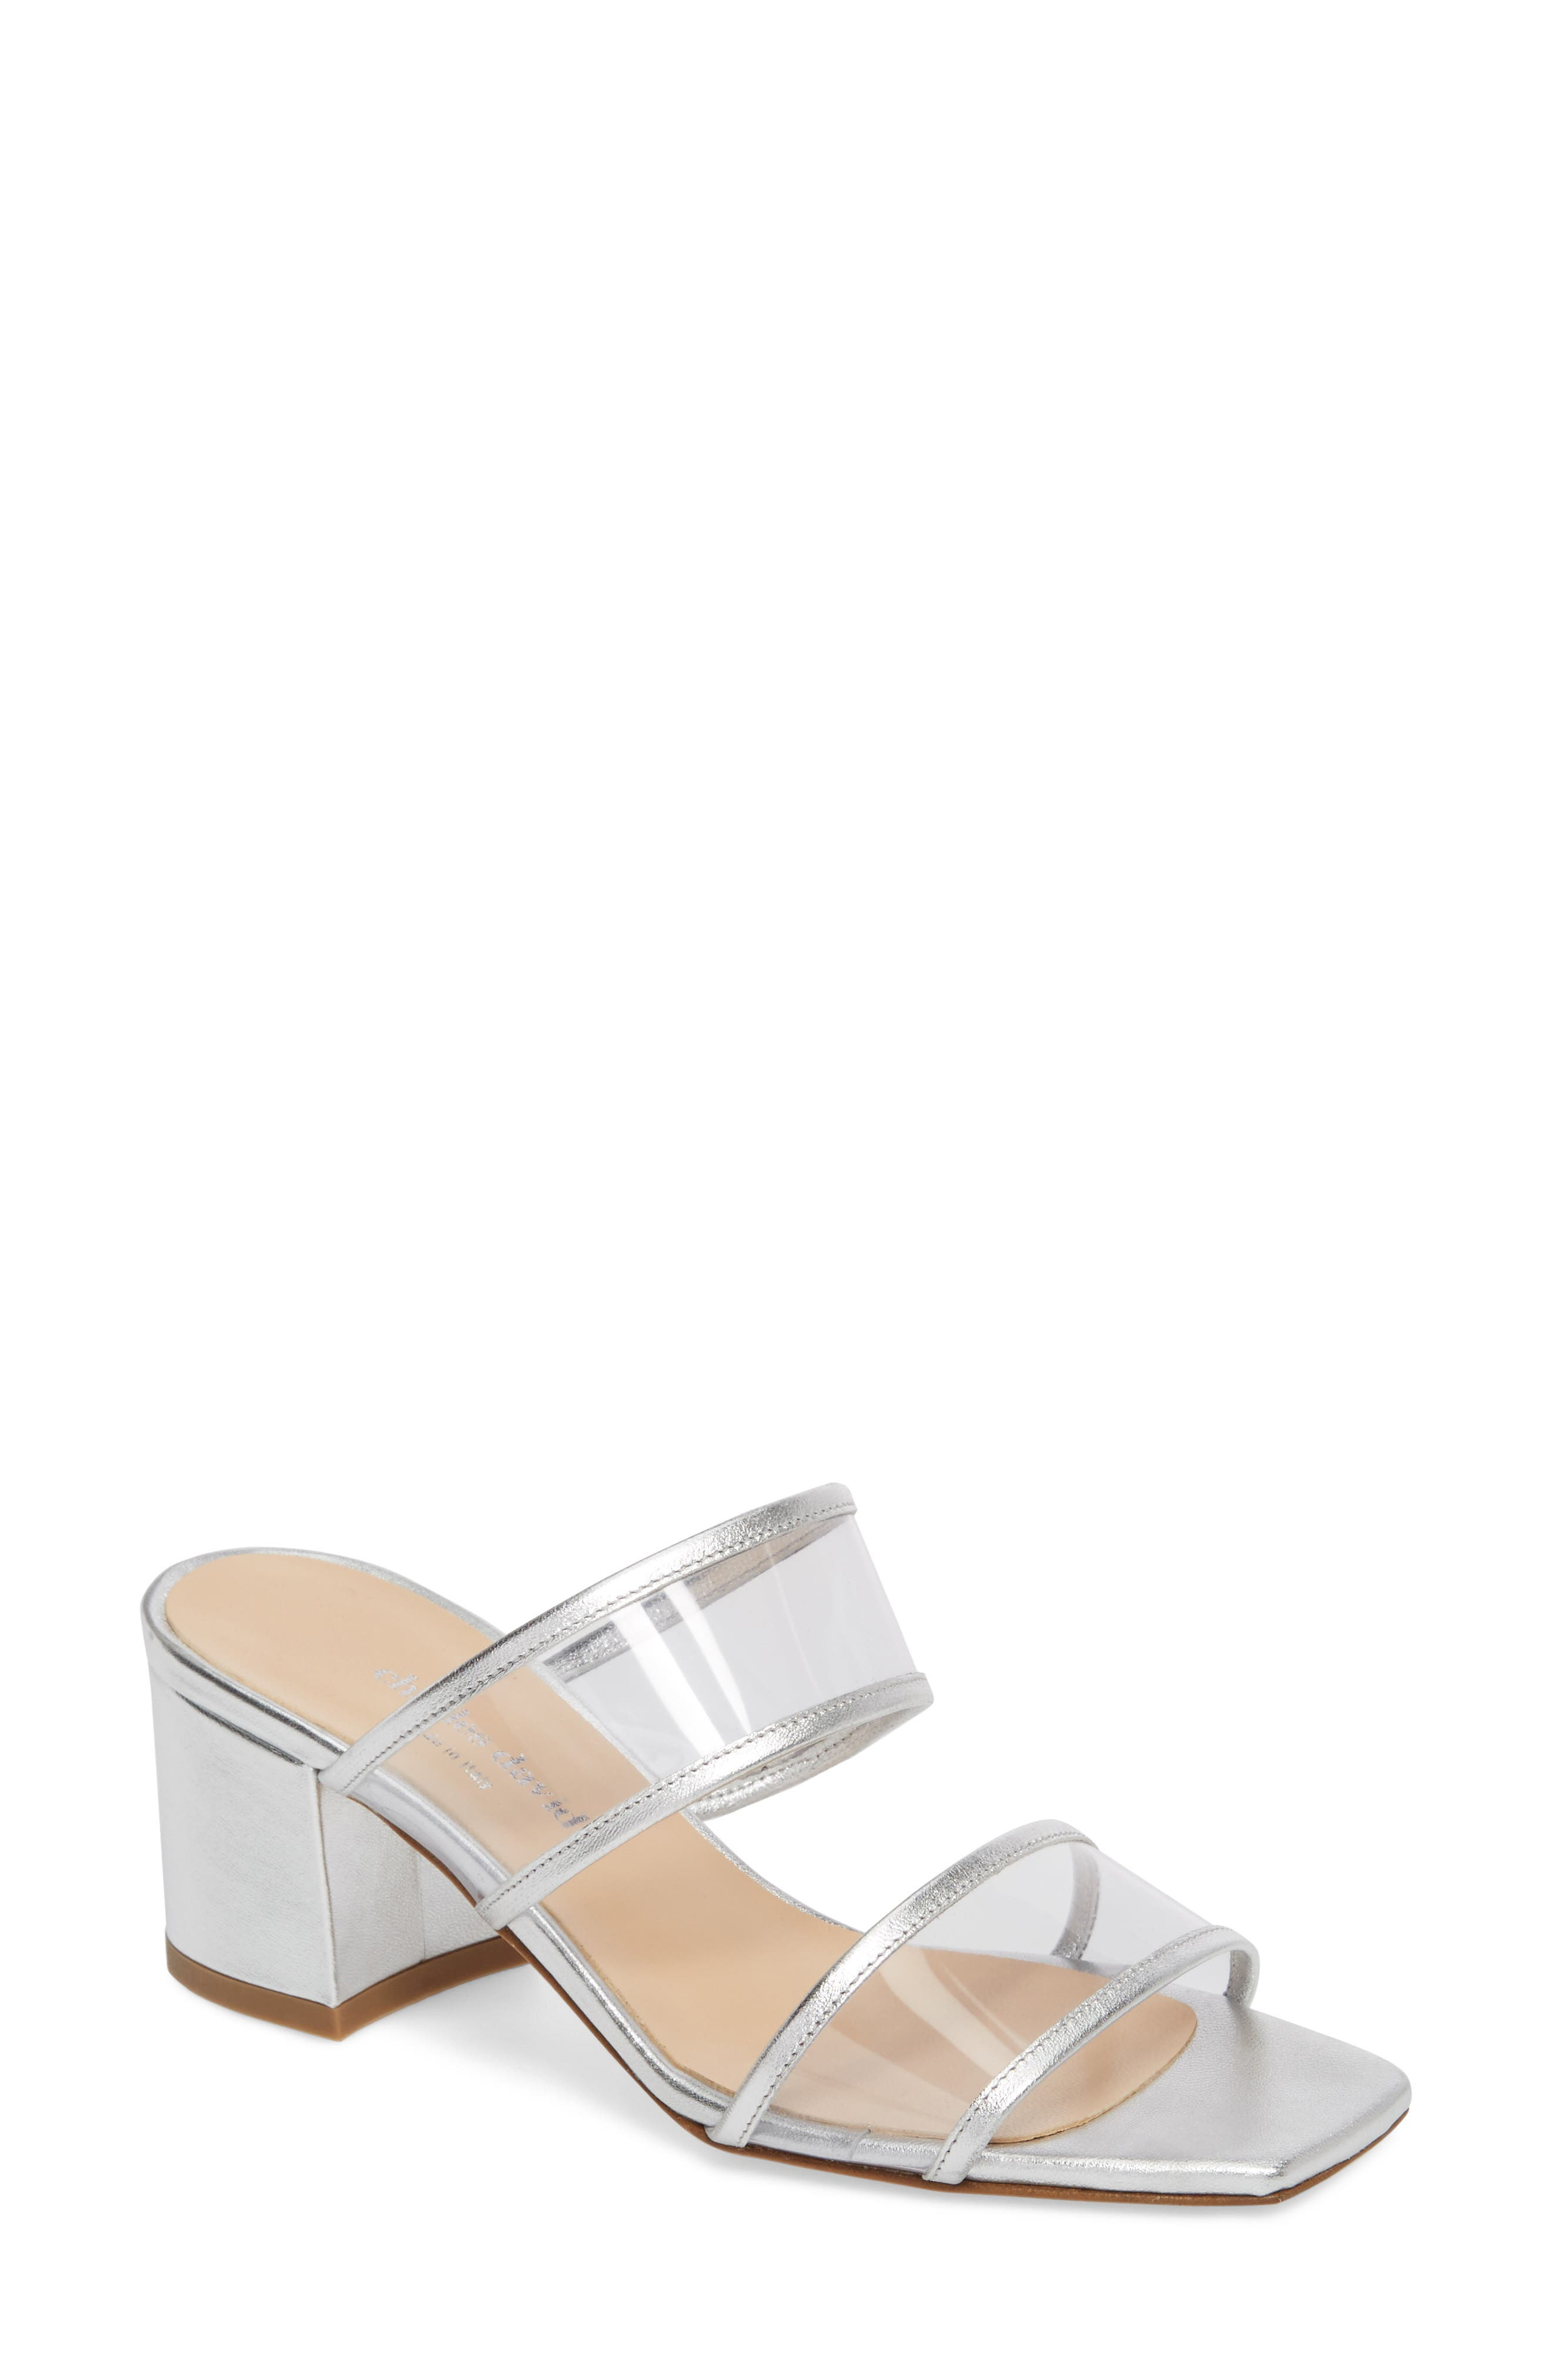 Cally Transparent Strap Slide Sandal,                         Main,                         color, Silver